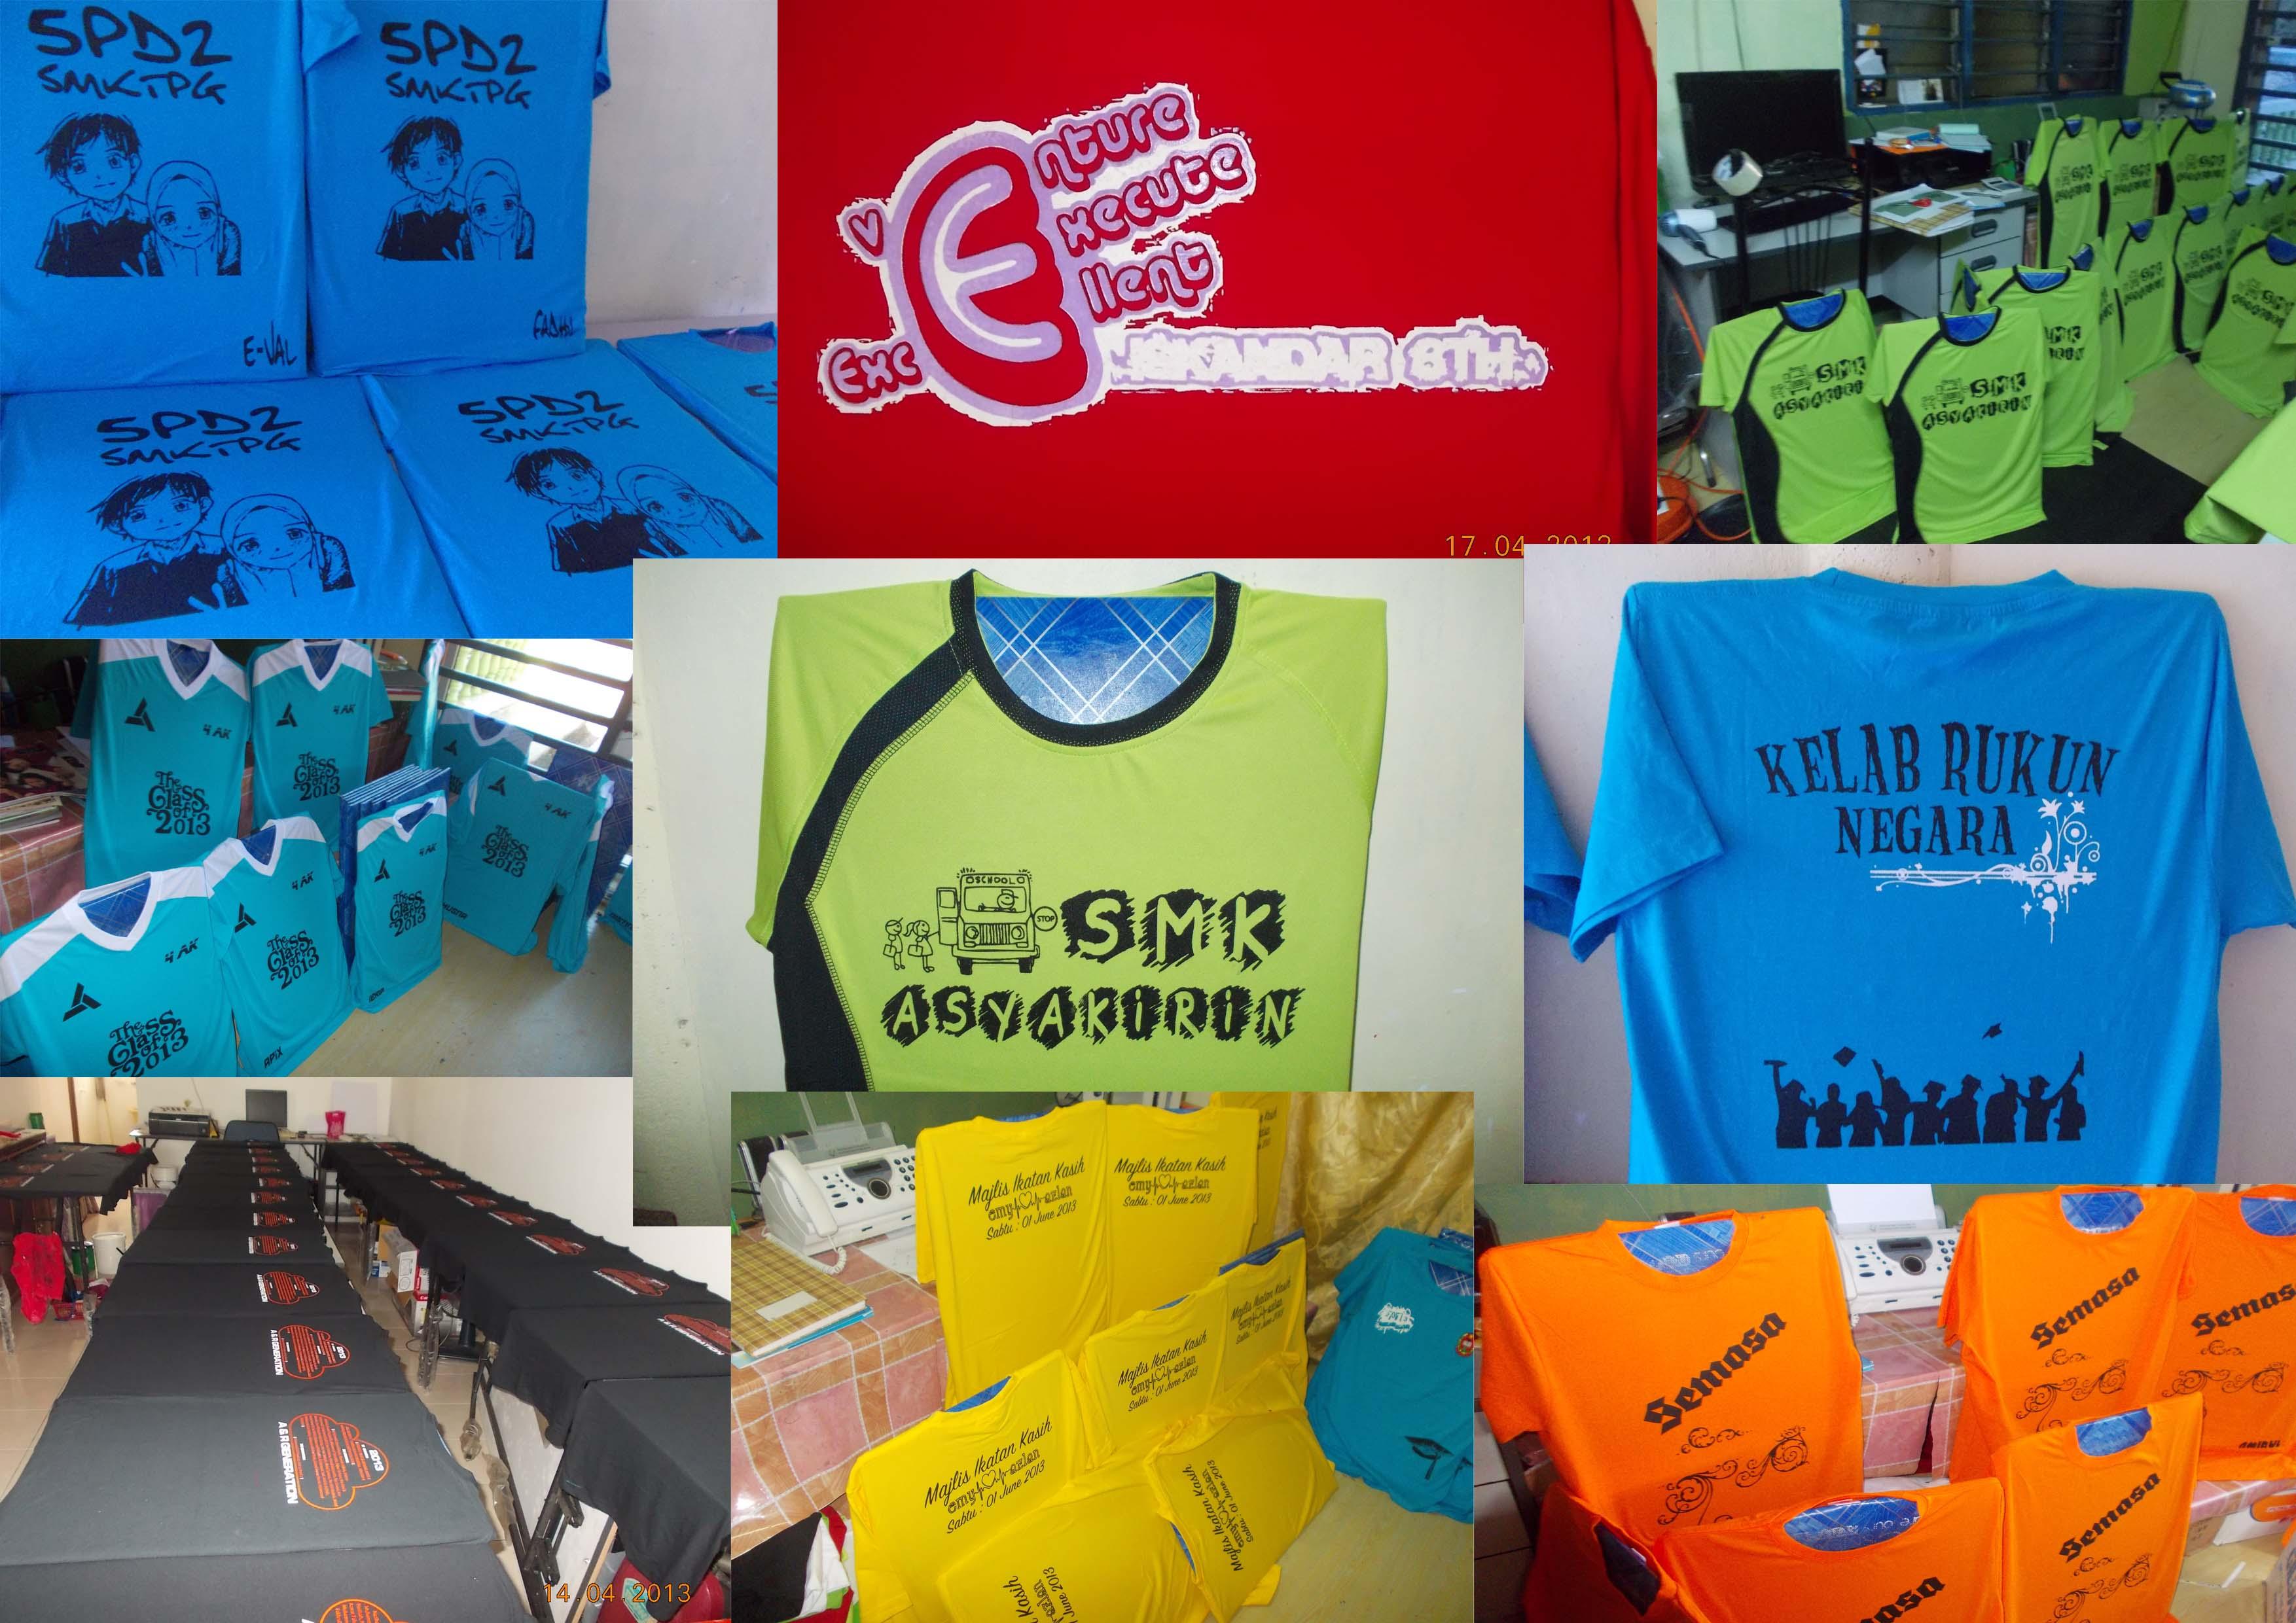 Design baju t shirt kelas -  Tshirt Kelas Sendiri Nanti Gambar Cetaktee 2b